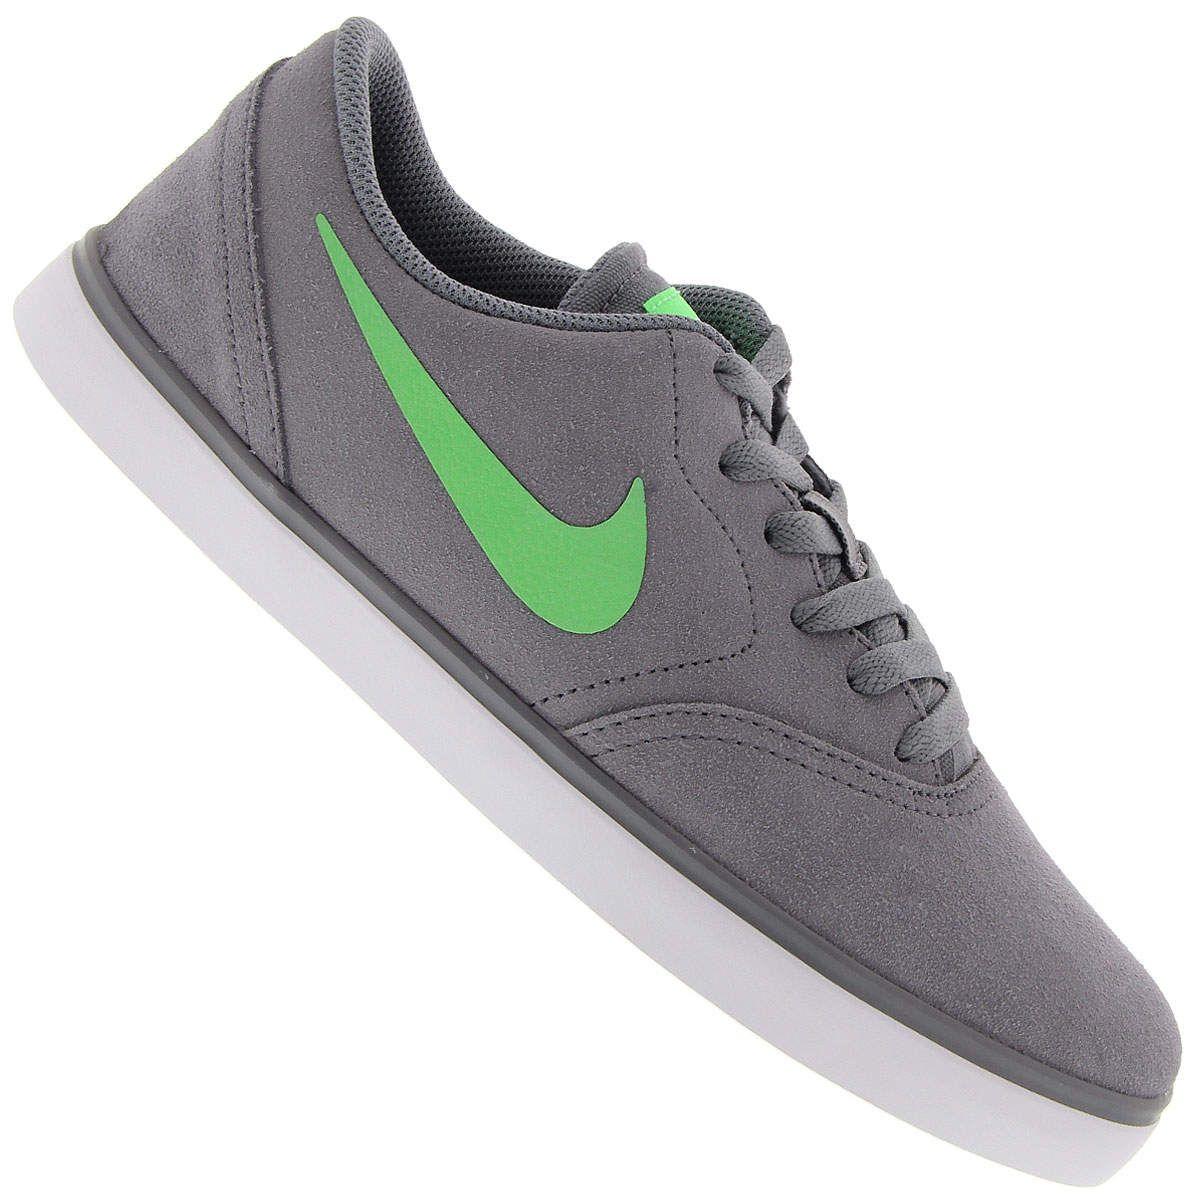 Tênis Nike SB Check Masculino   roupas   Pinterest   Tenis, Tenis ... 8073d3d31f